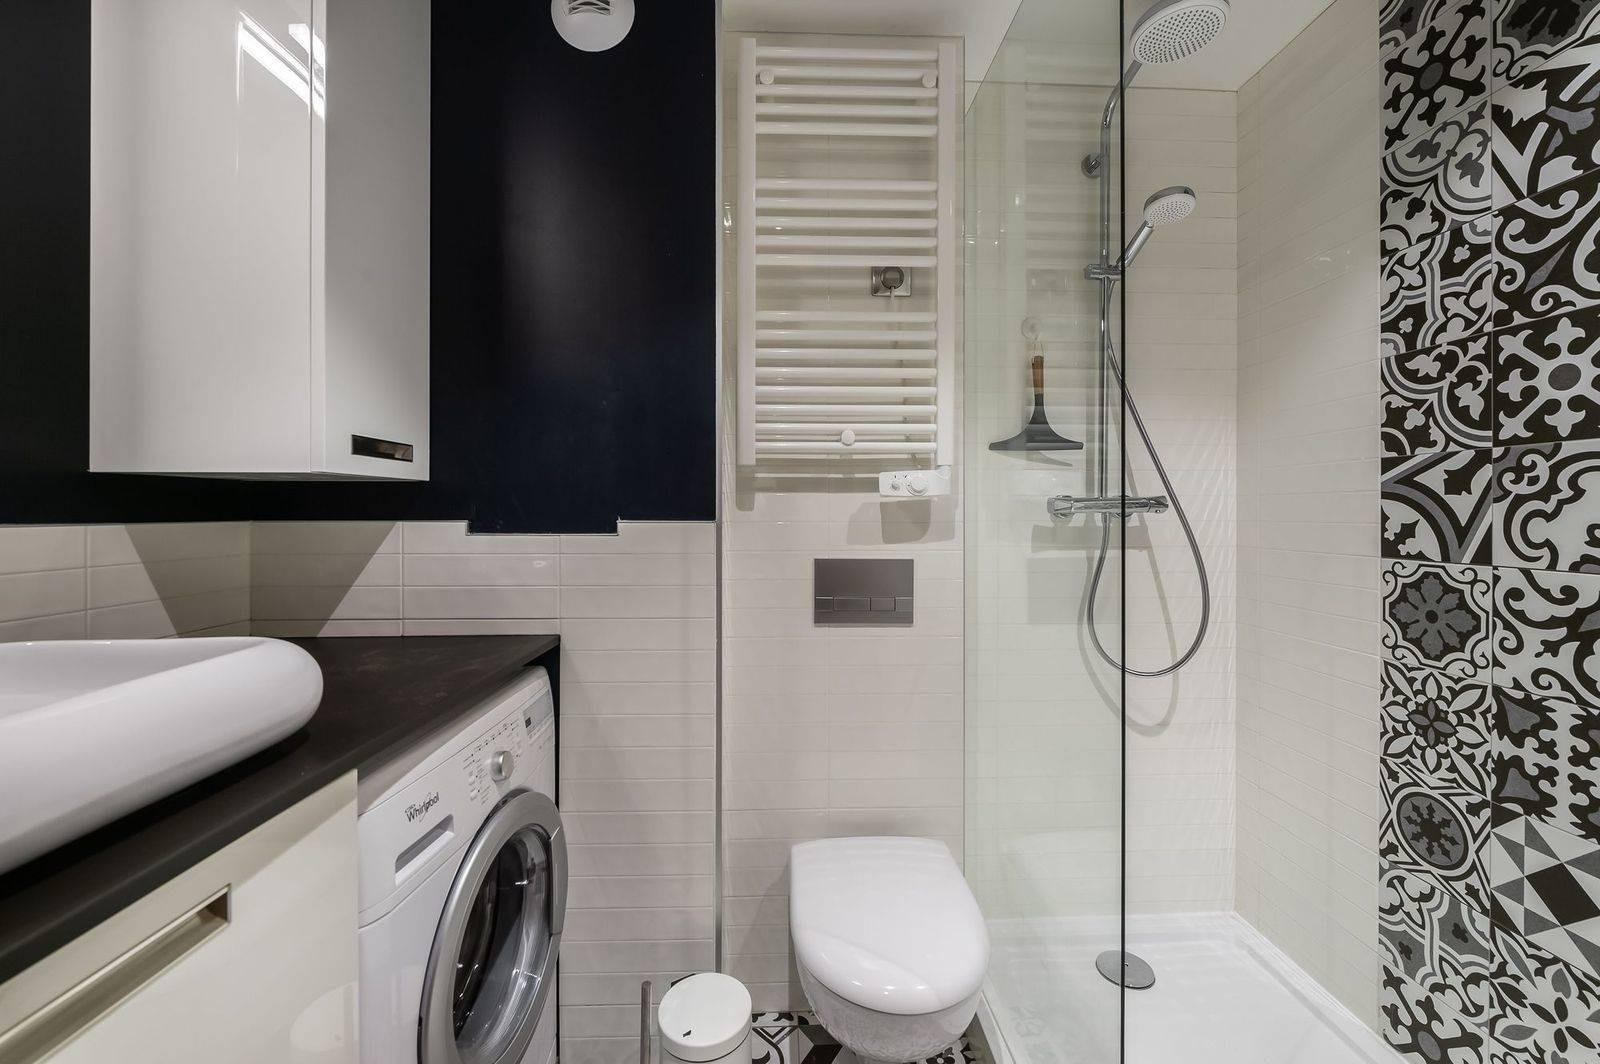 Val d'Isère Luxury Rental Appartment Virlouve Bathroom